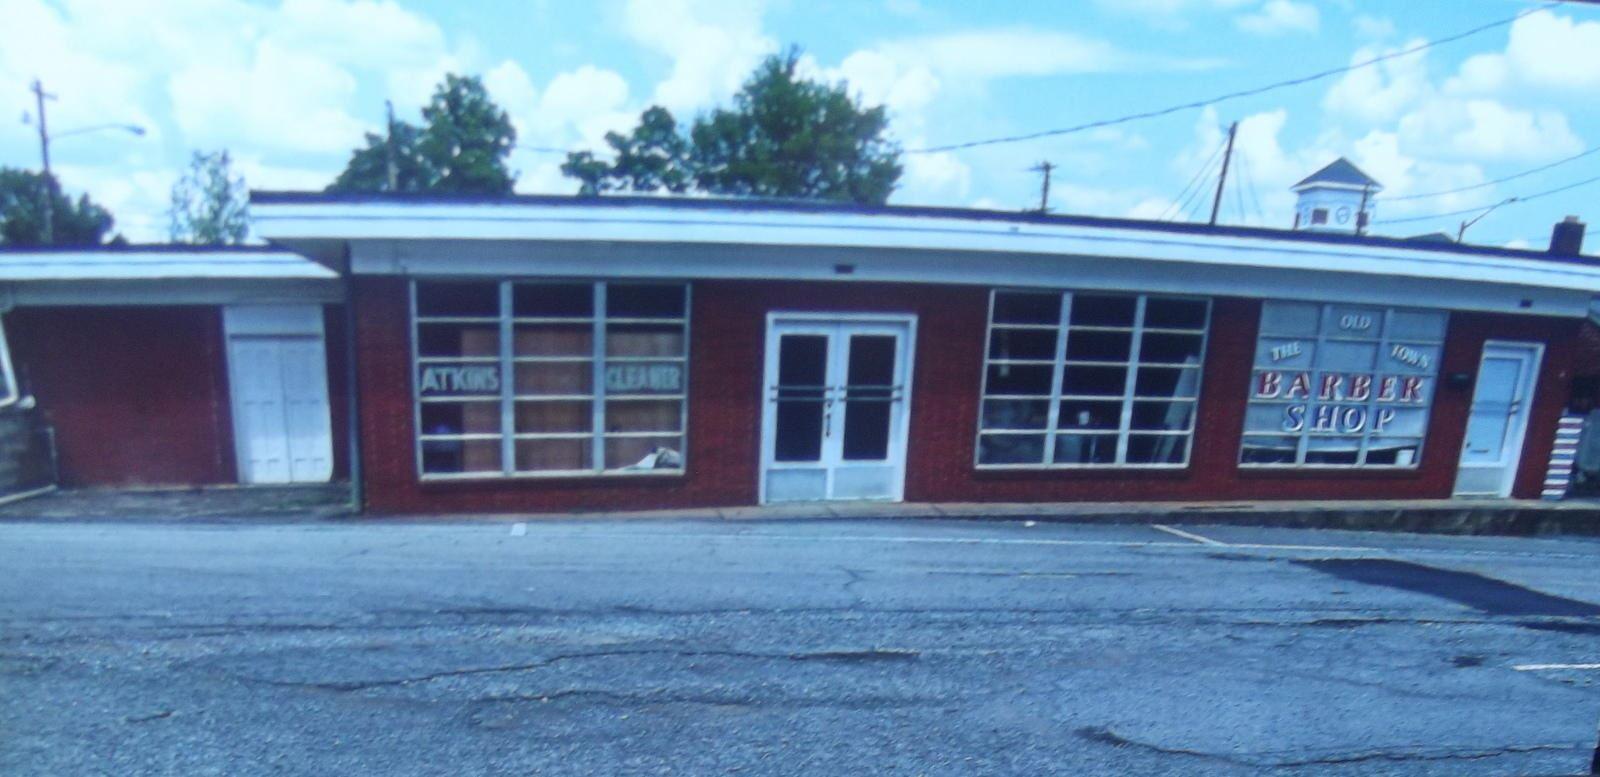 Photo of 108 & 110 Church St, Madisonville, TN 37354 (MLS # 1155432)